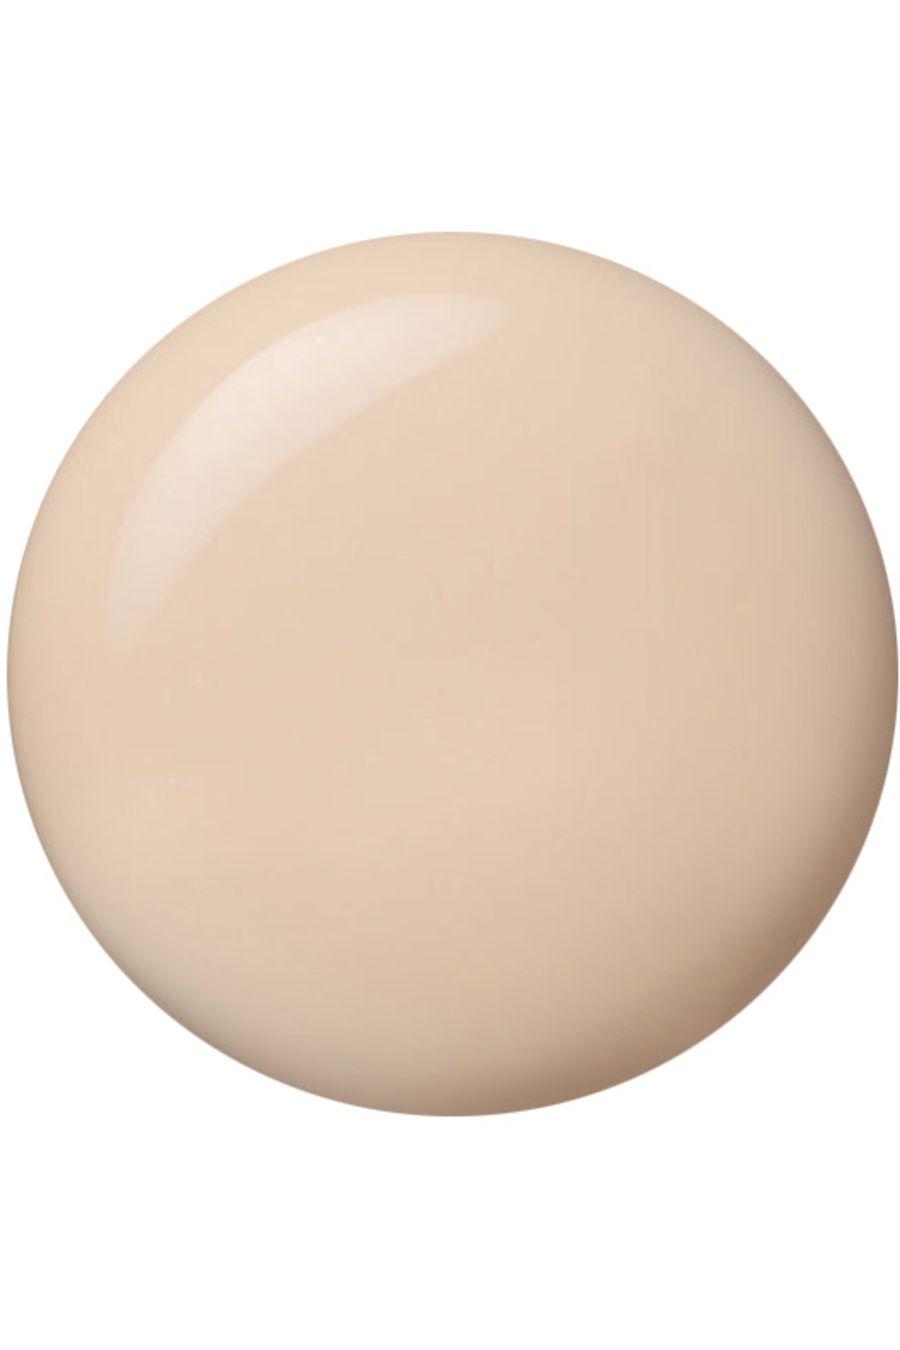 Blissim : Paul & Joe - Base de Maquillage Hydratante - Dragée 01